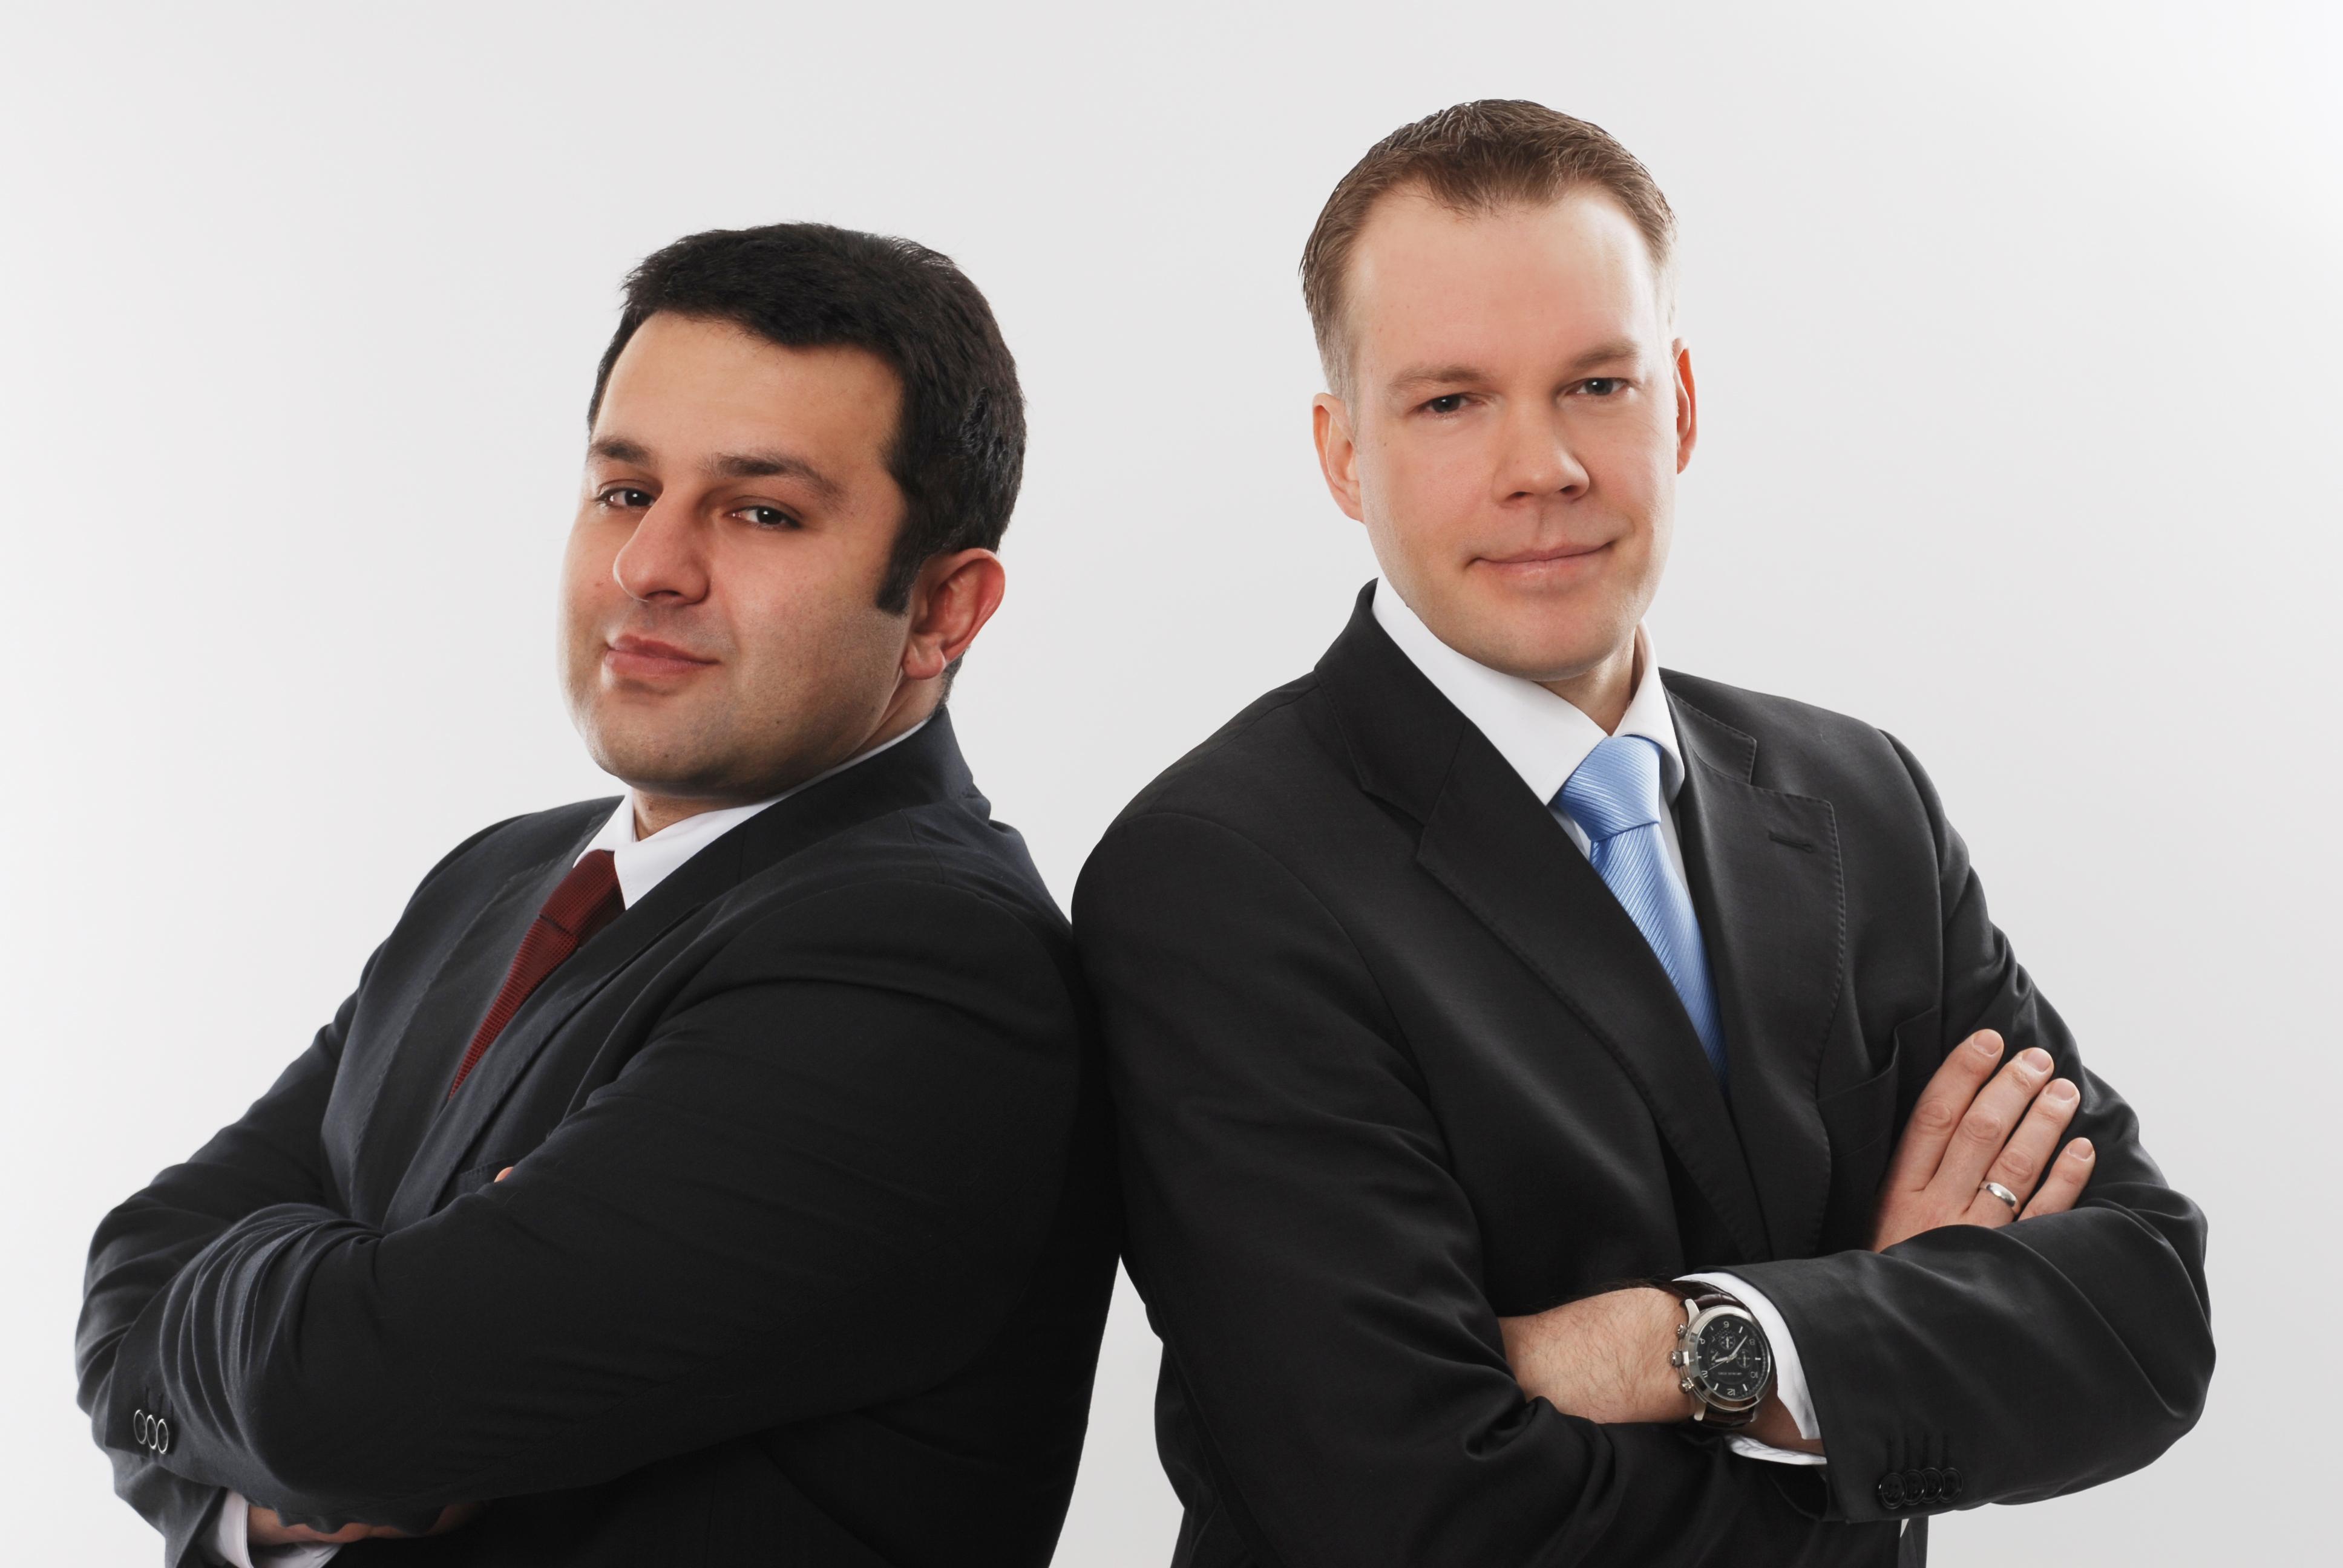 Rechtsanwalt Für Arbeitsrecht In Hamburg Altona Ali Oezkan